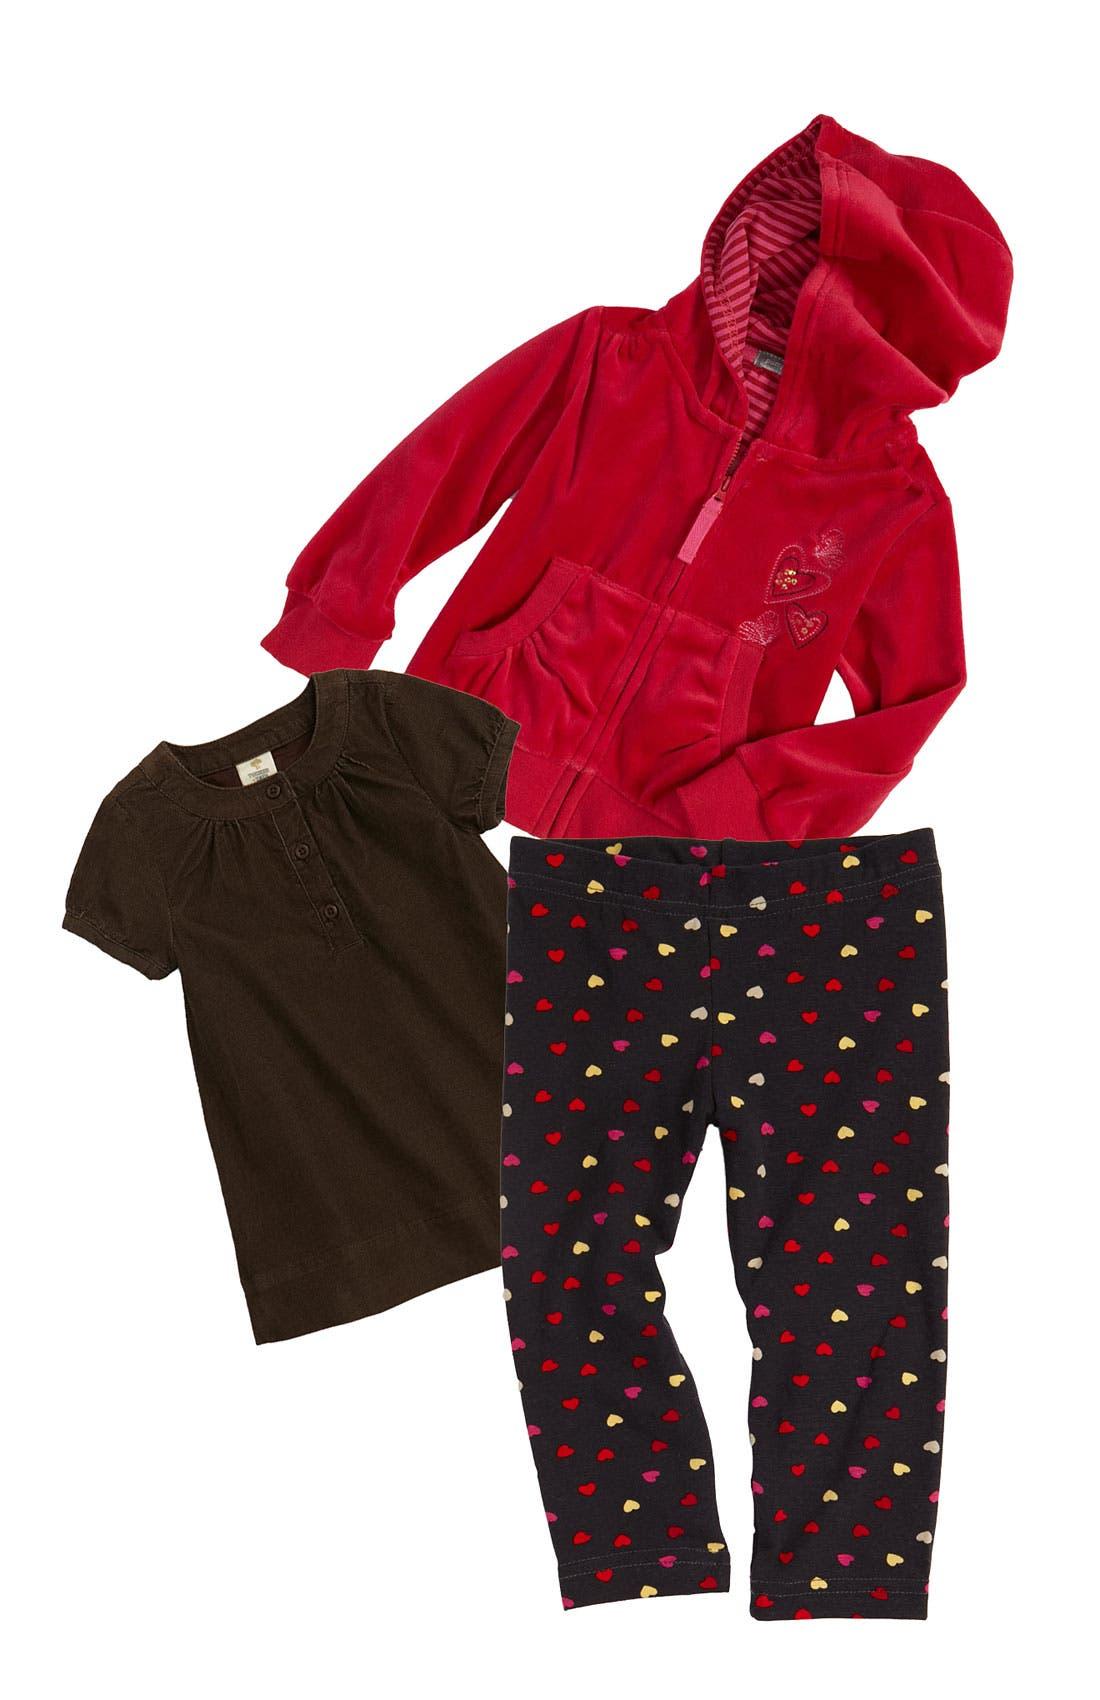 Main Image - Tucker + Tate Dress & Pumpkin Patch Sweater (Toddler)